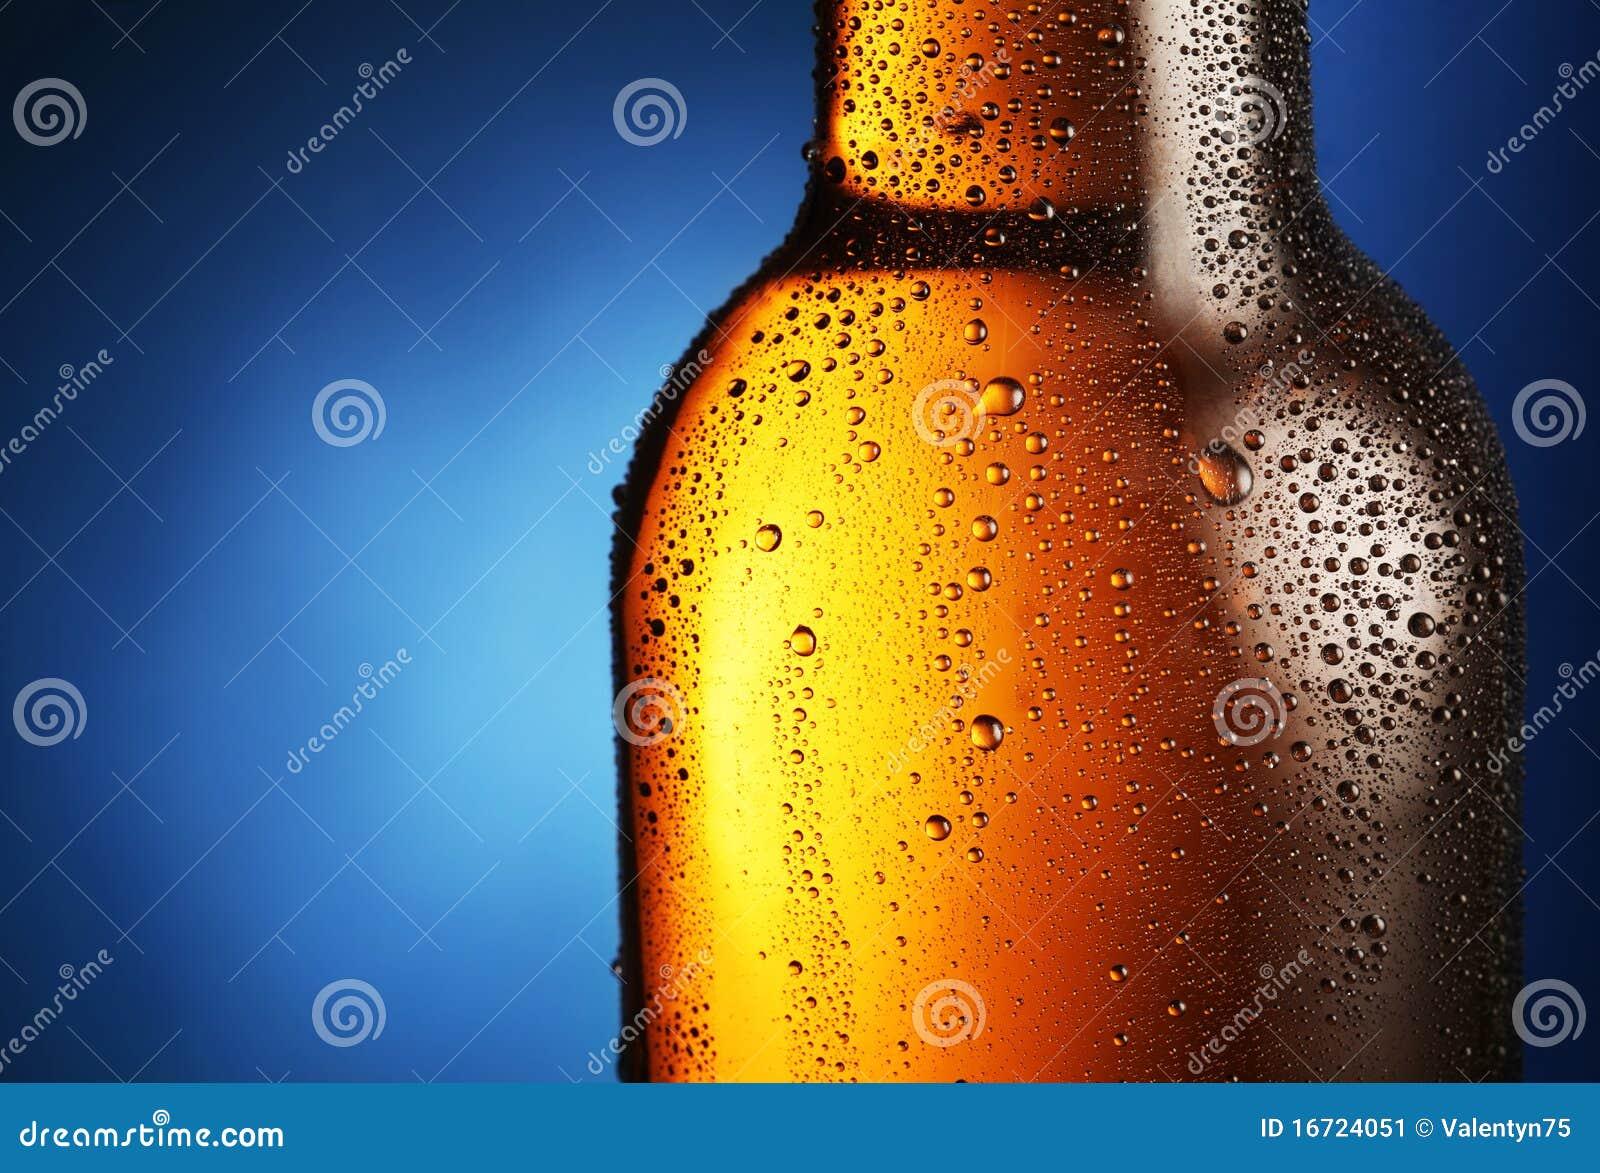 El tratamiento del alcoholismo voronezh uritskogo